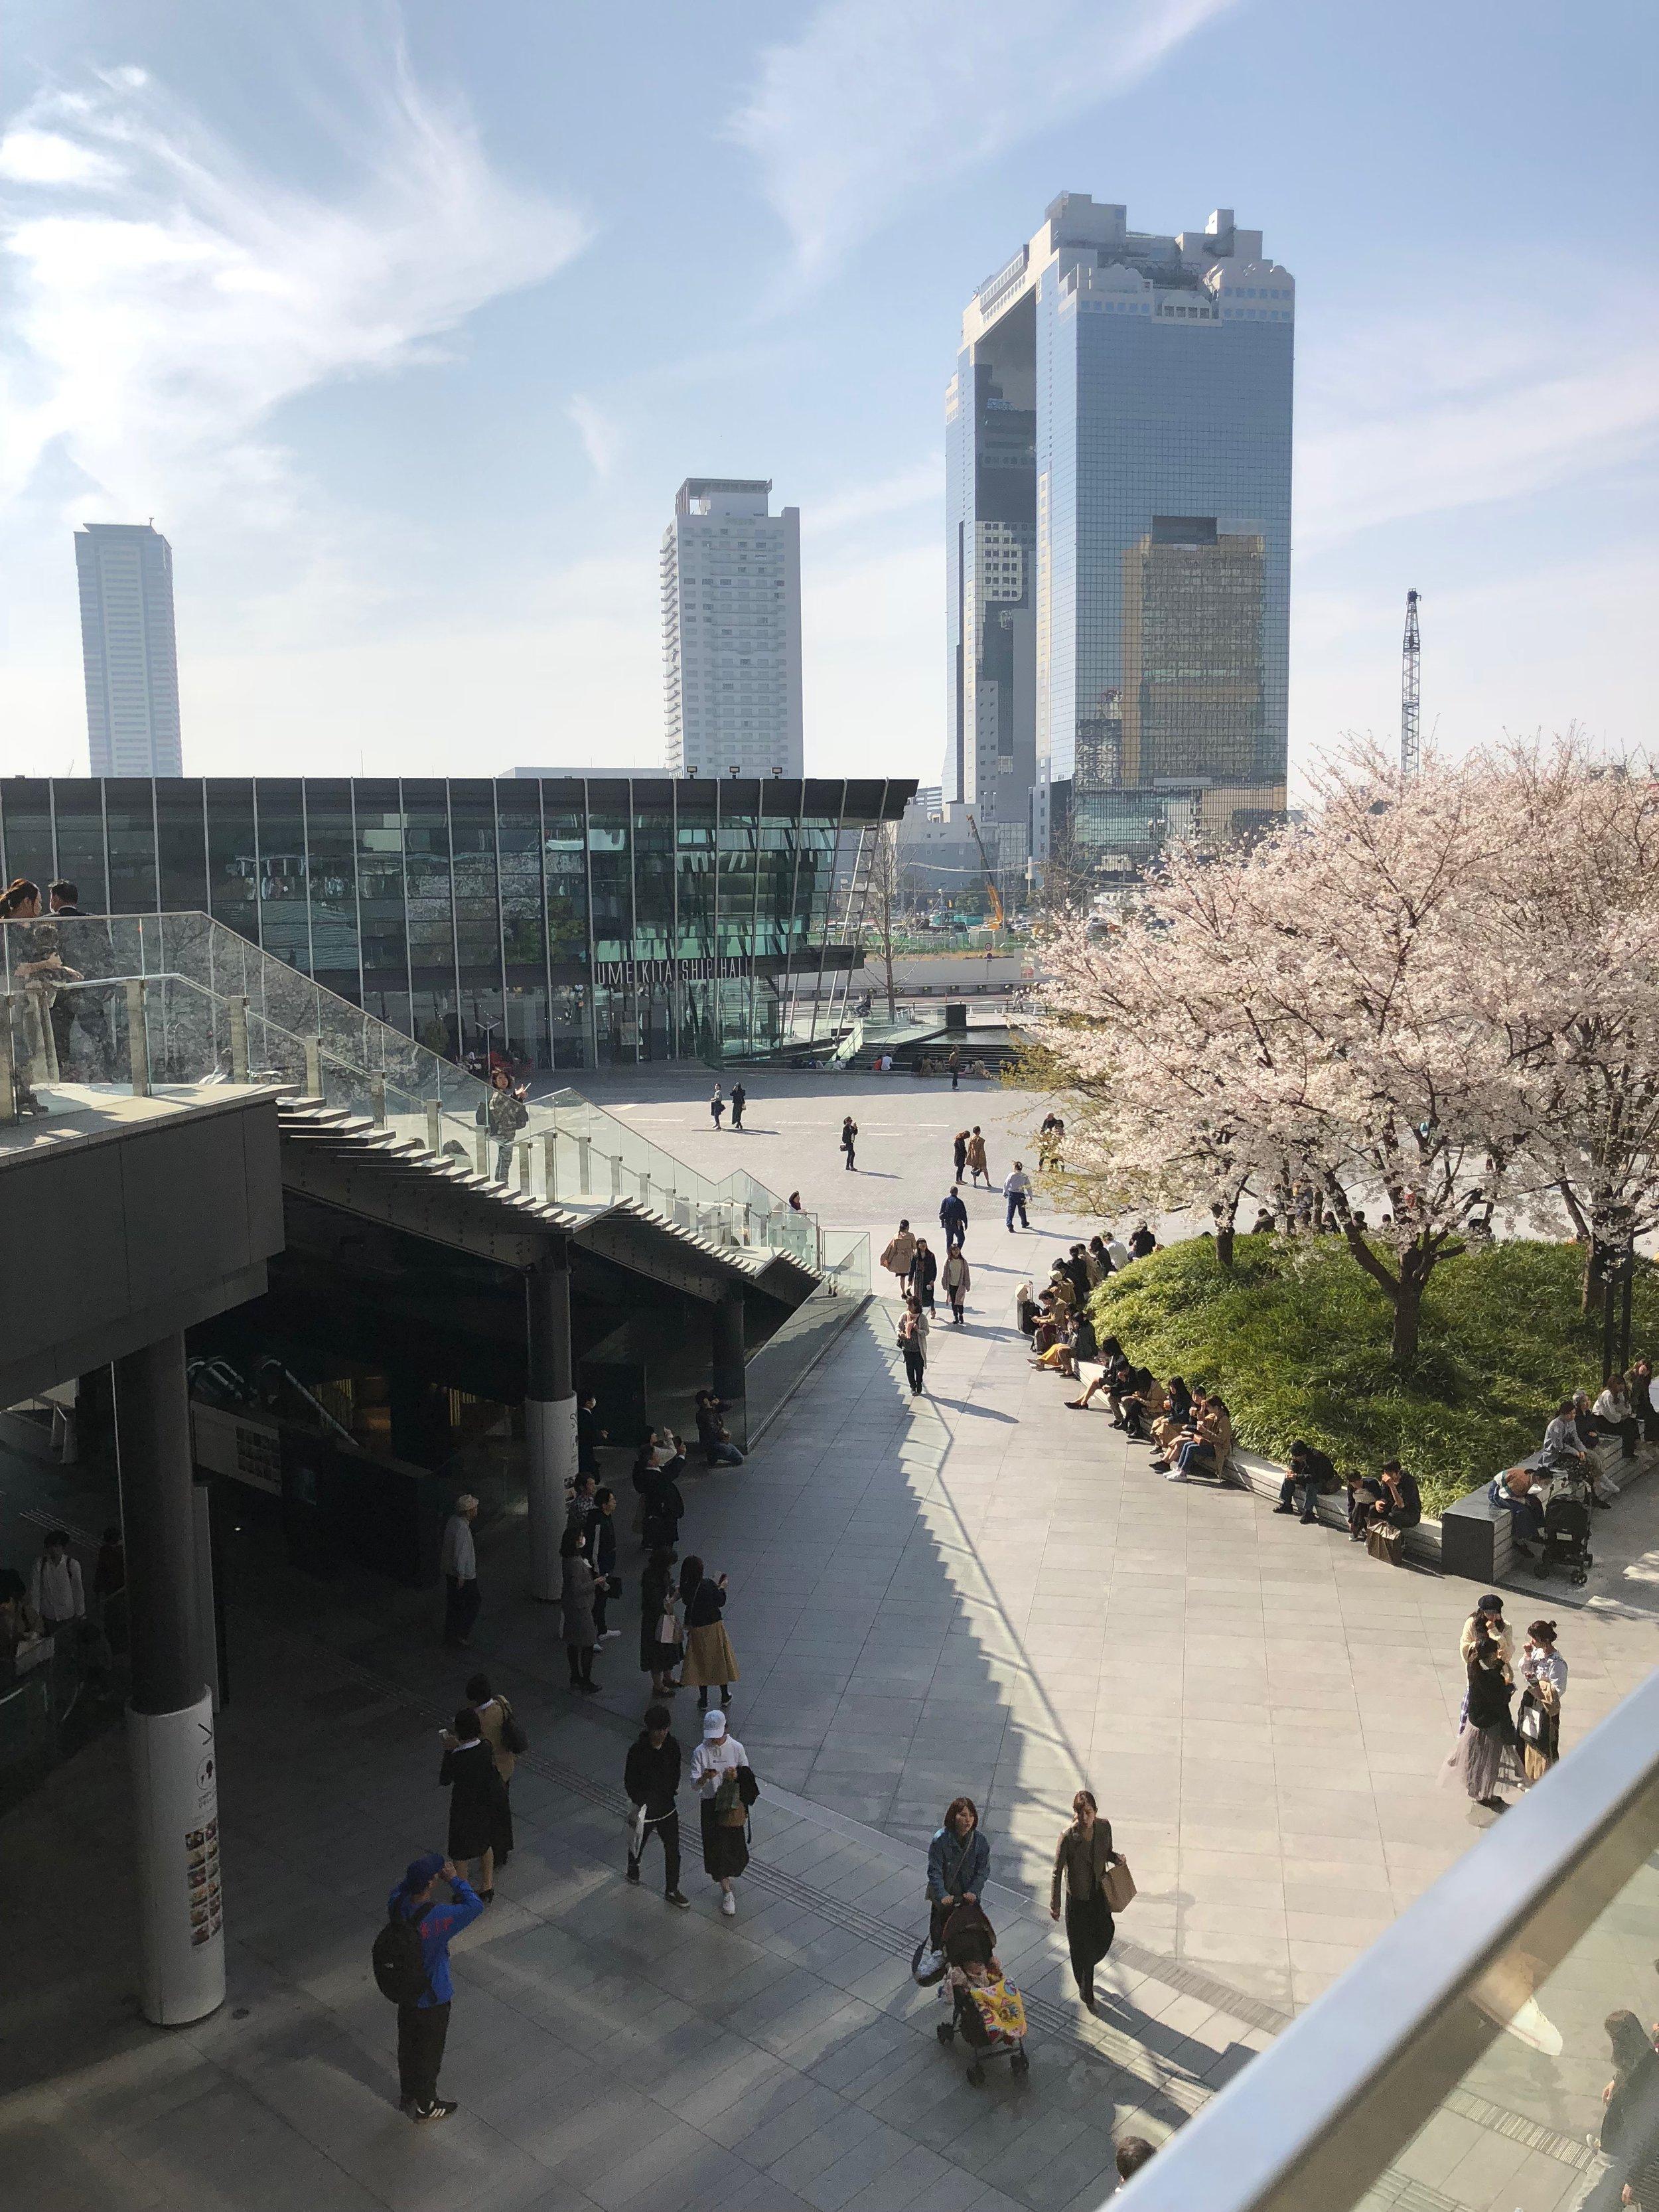 Osaka on meethaha.com